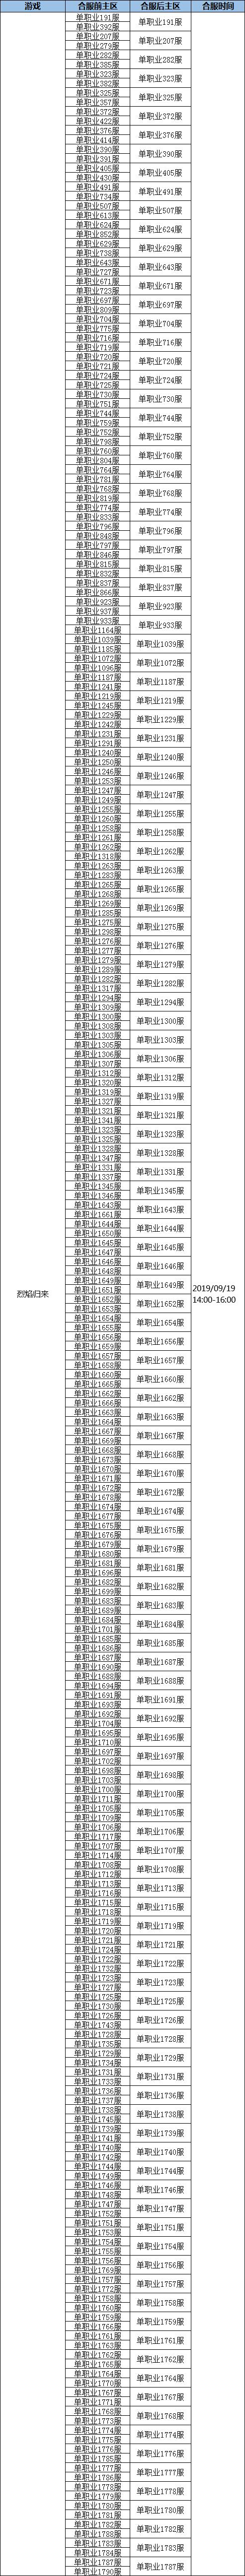 饮血9月19日合区.png